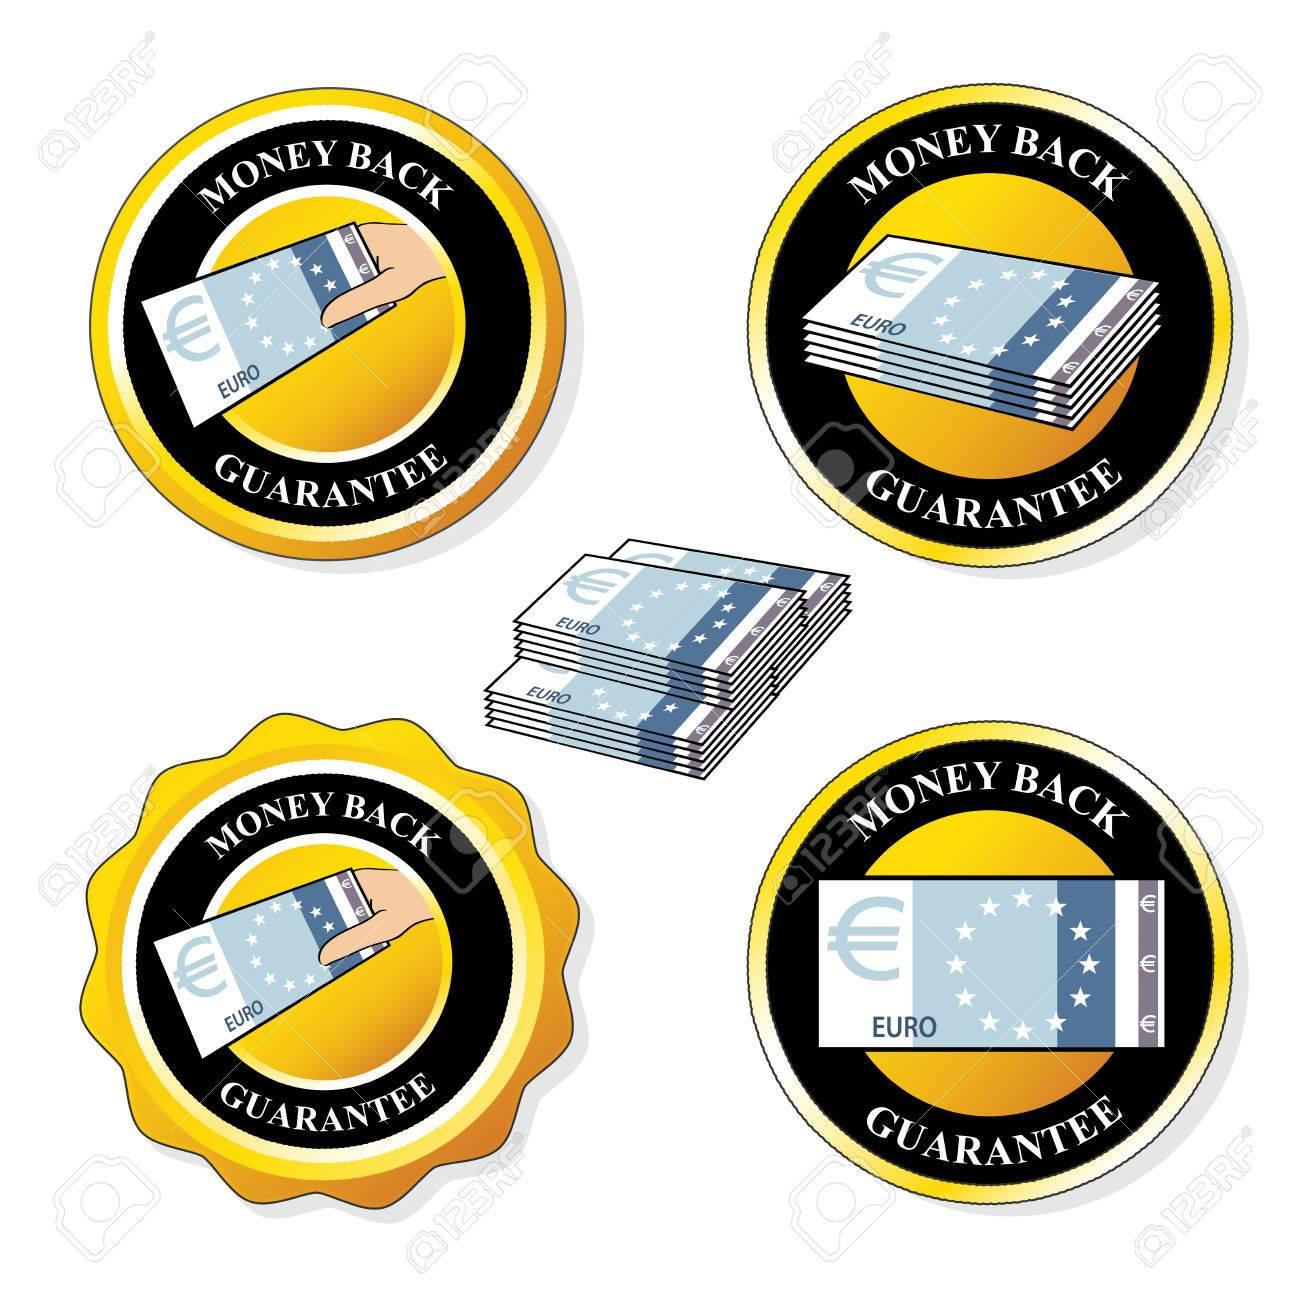 Vector money back guarantee icons, circular stickers with euro - illustration Stock Vector - 22755331